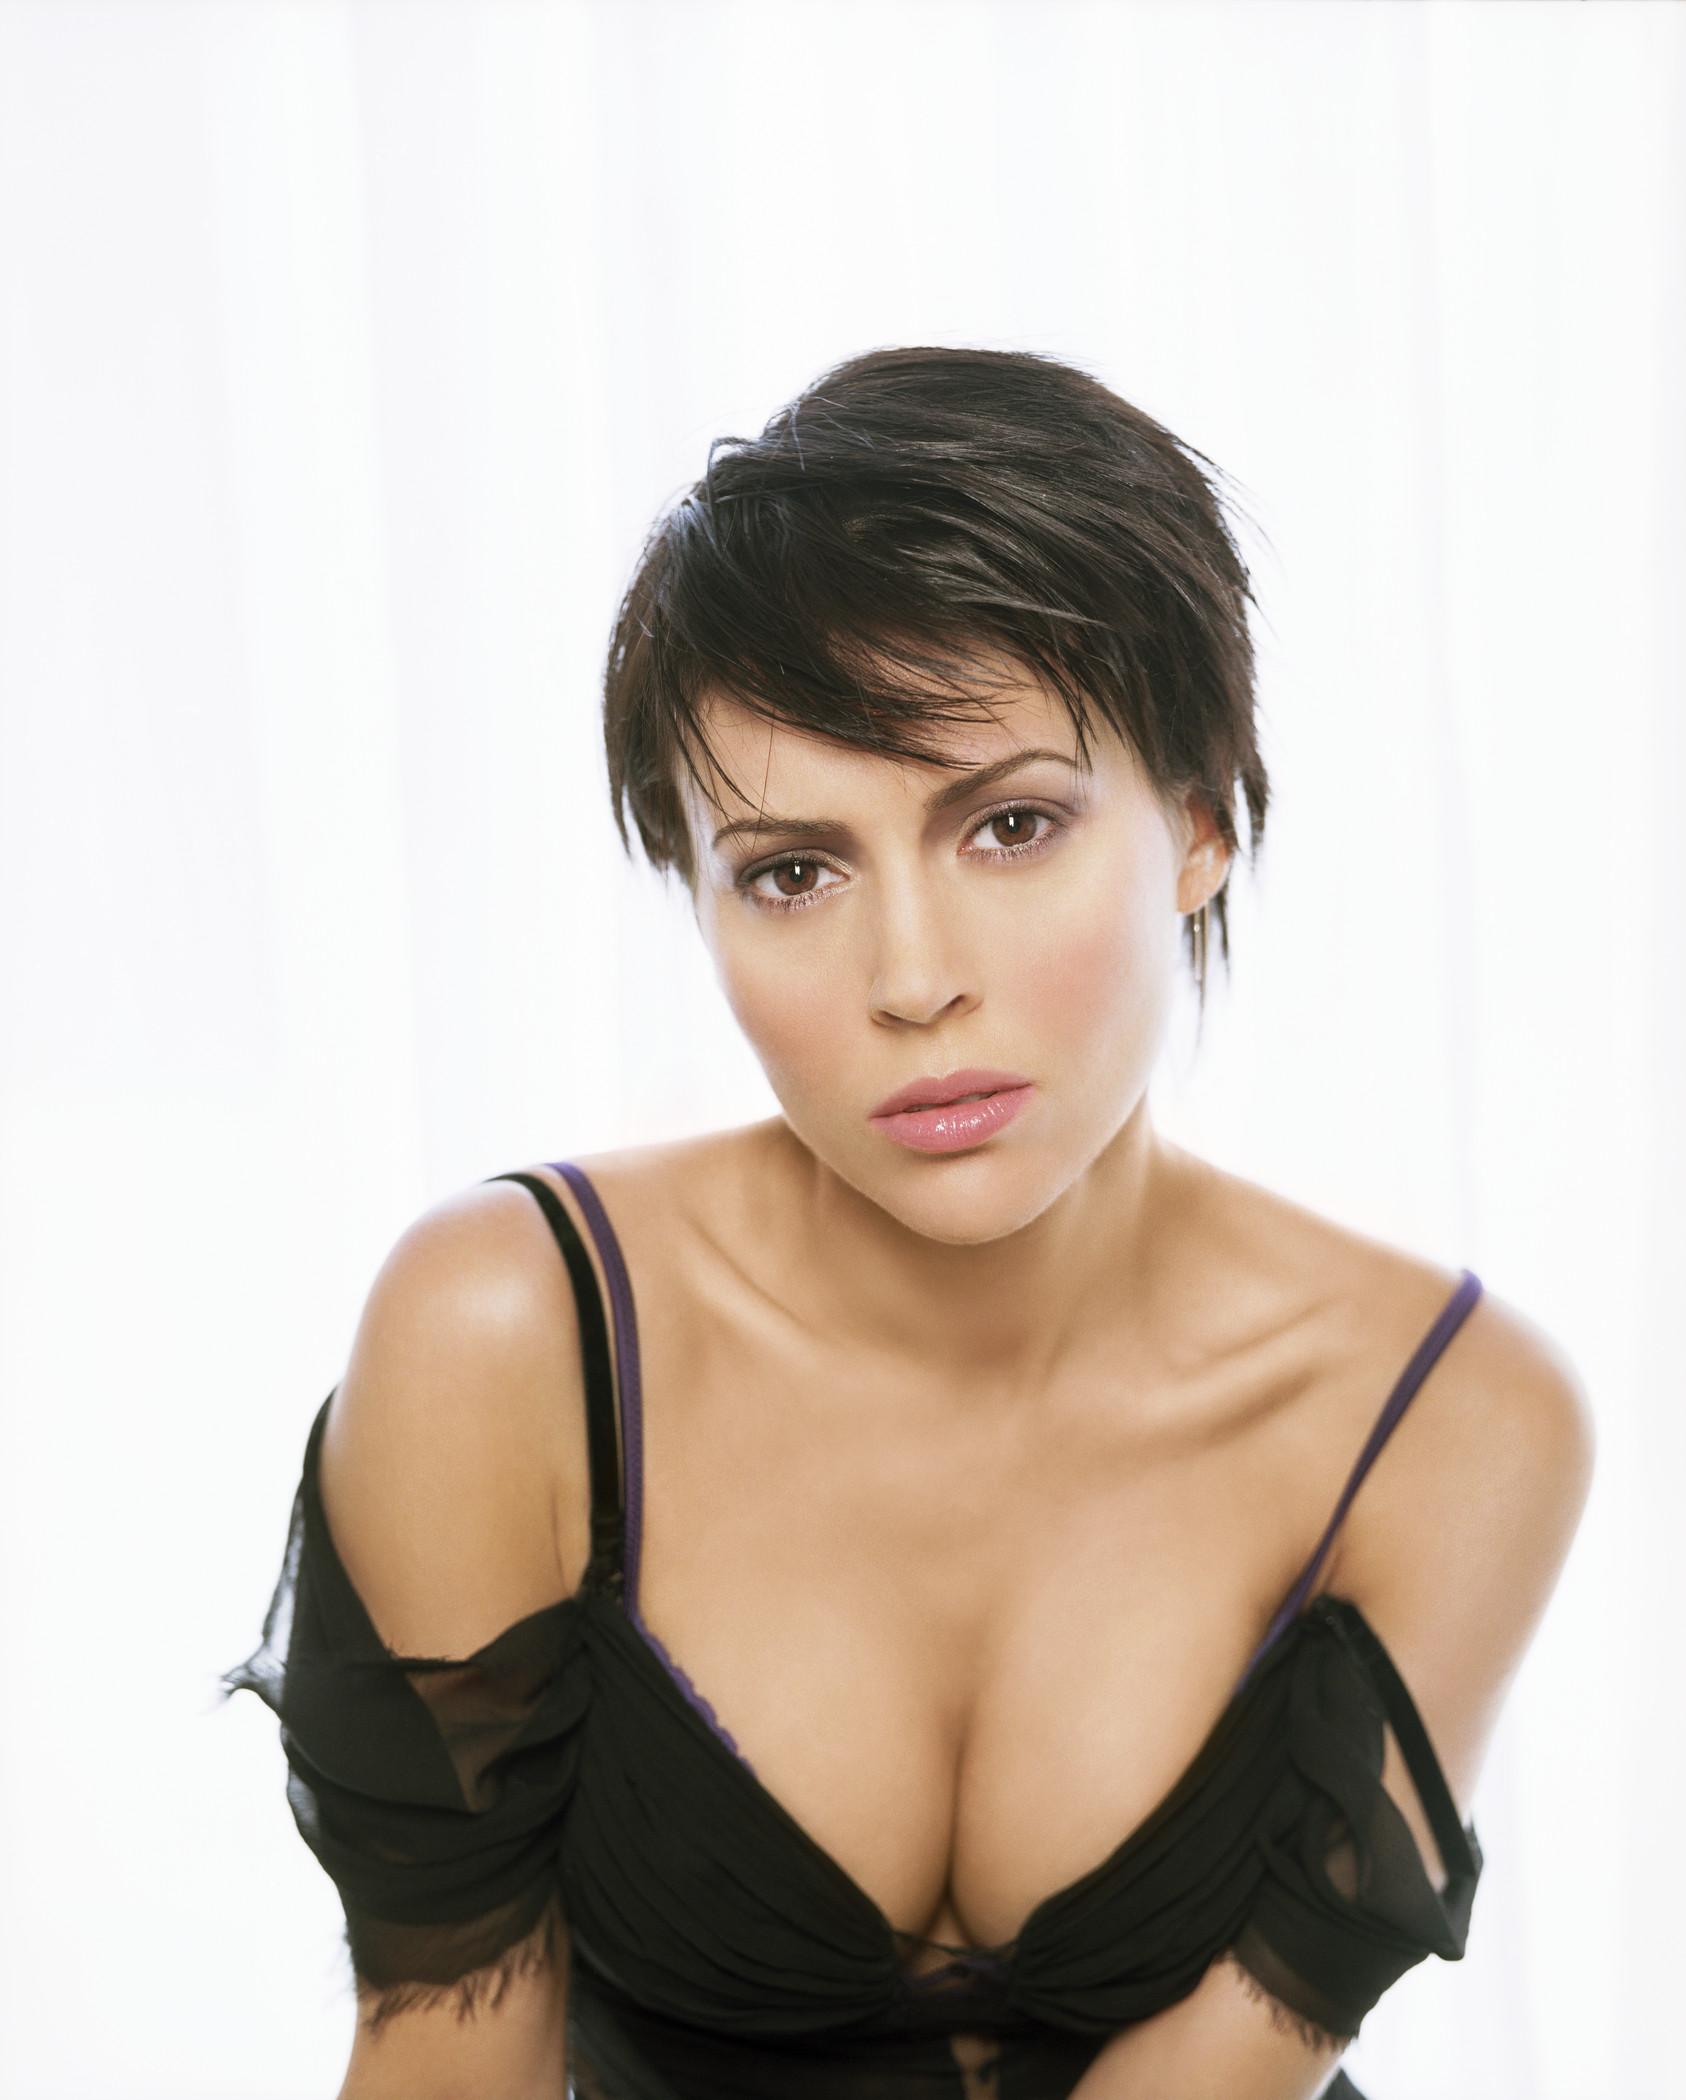 Alyssa milano embrace of the vampire slomo compilation 6